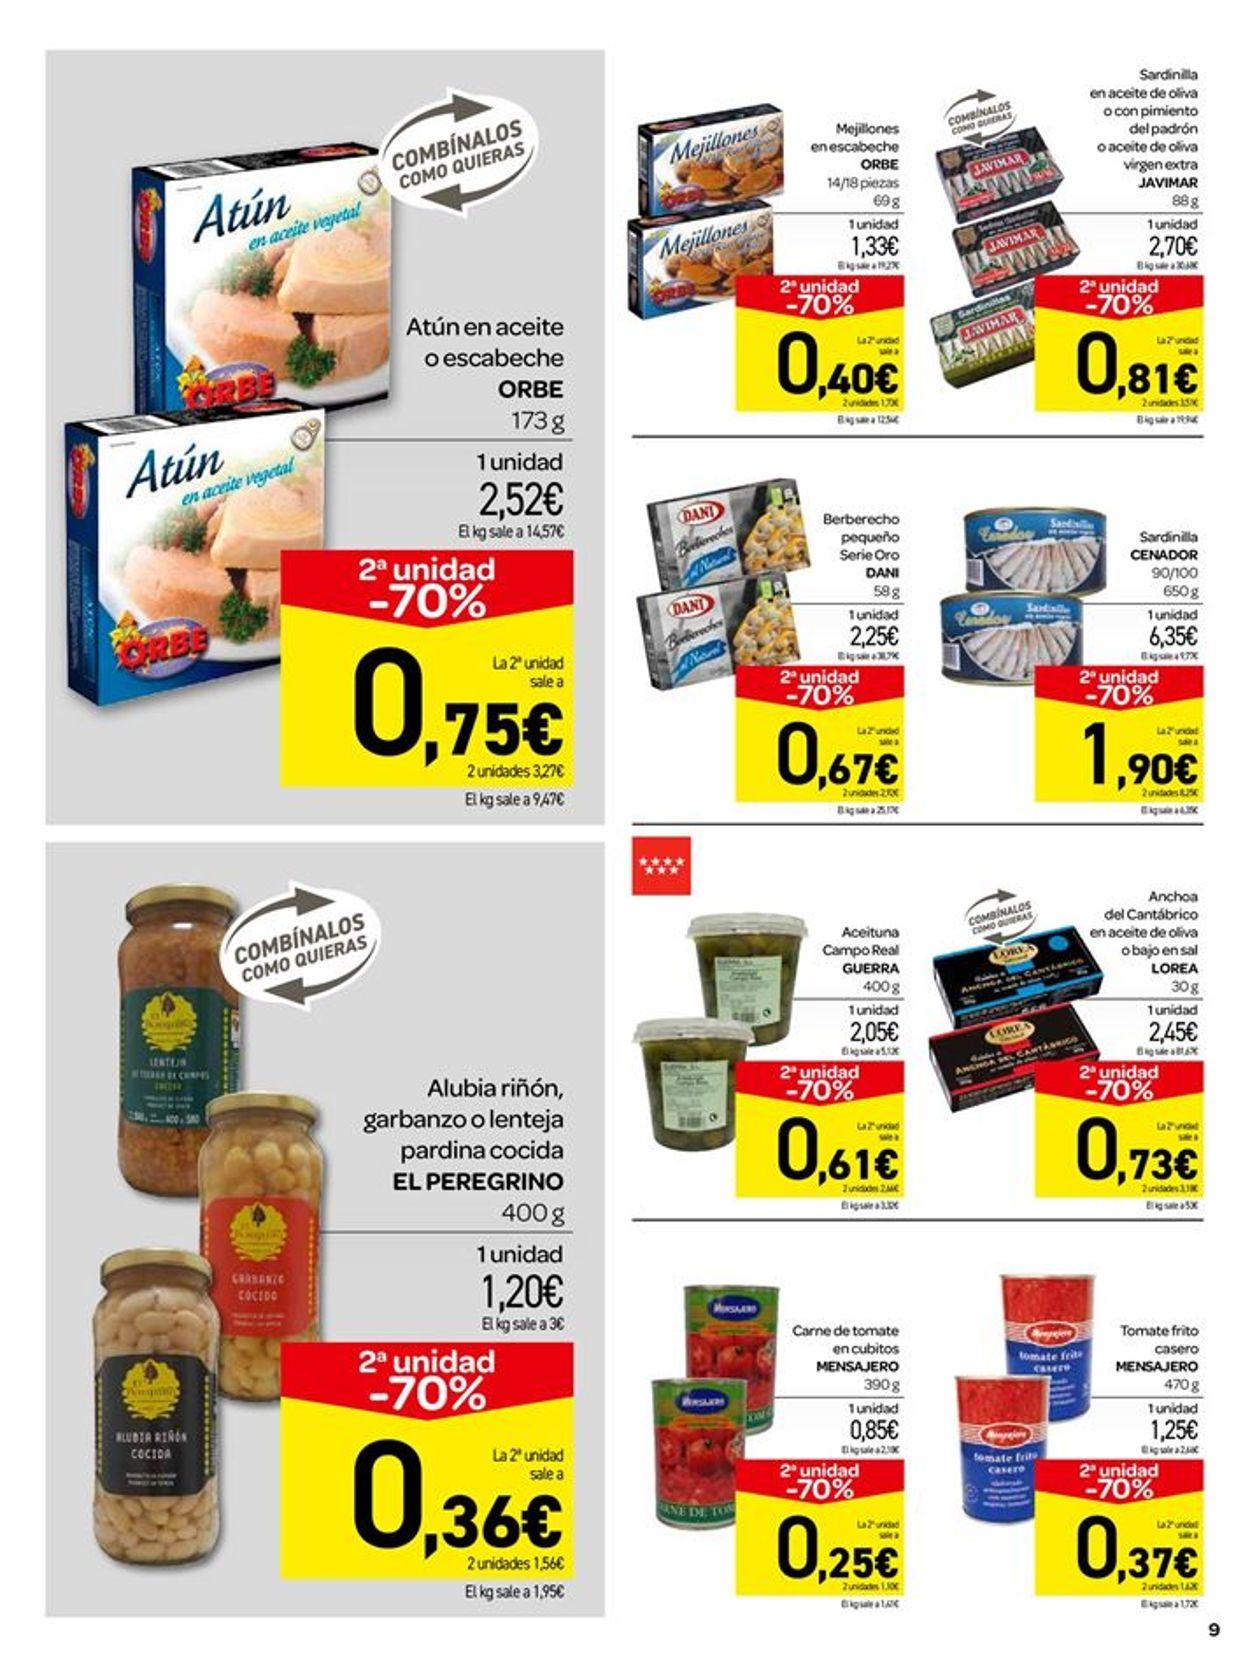 Carrefour Folleto - 10.07-24.07.2019 (Página 9)